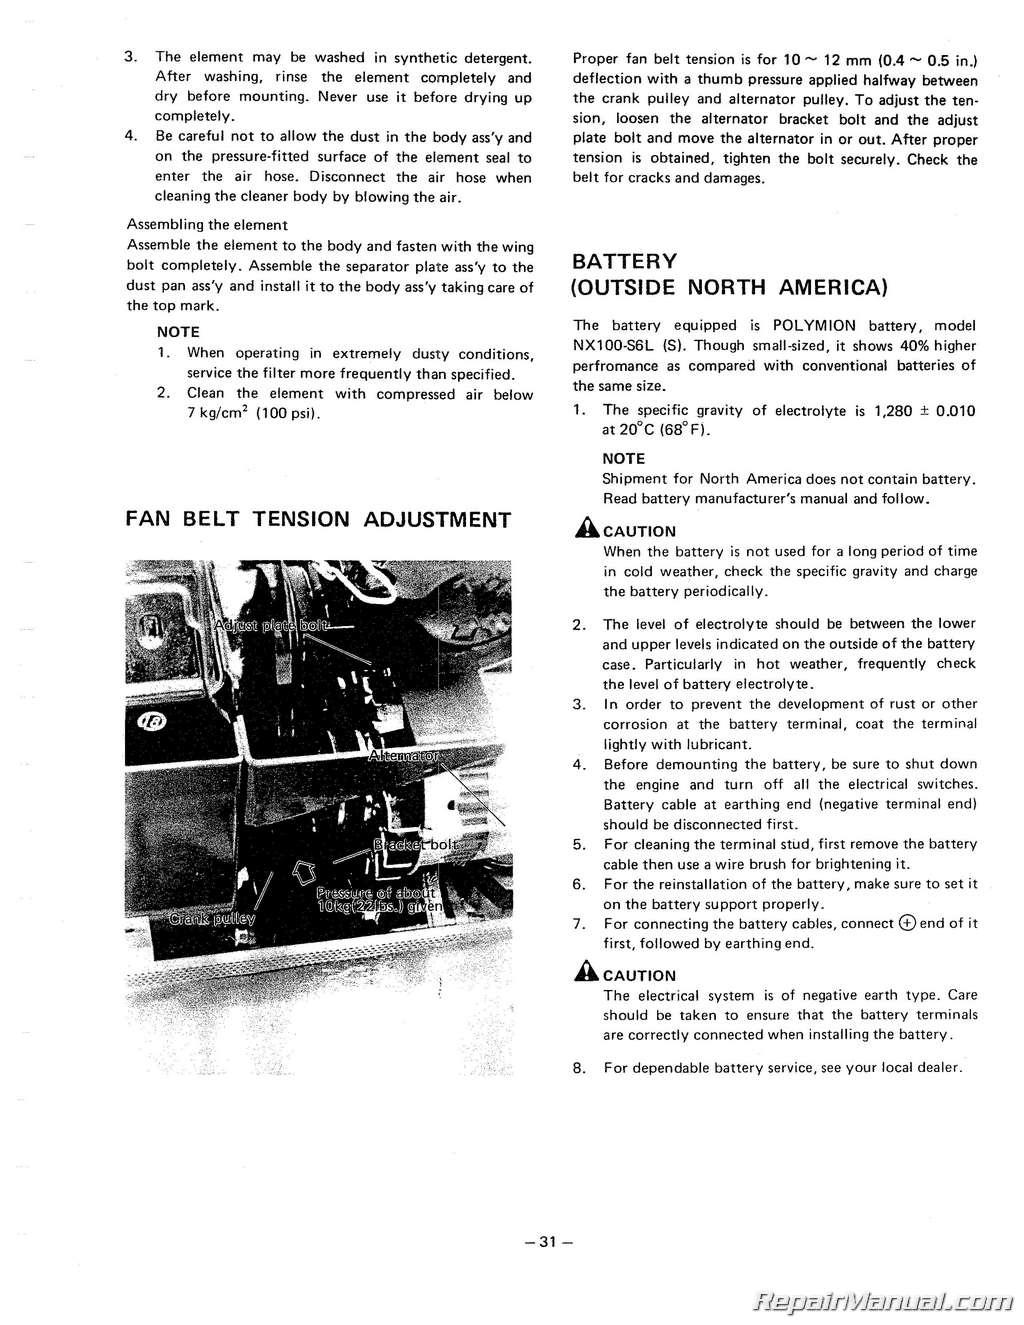 mitsubishi compact tractor wiring diagram mitsubishi mt160 – mt180 compact tractor operators manual ...